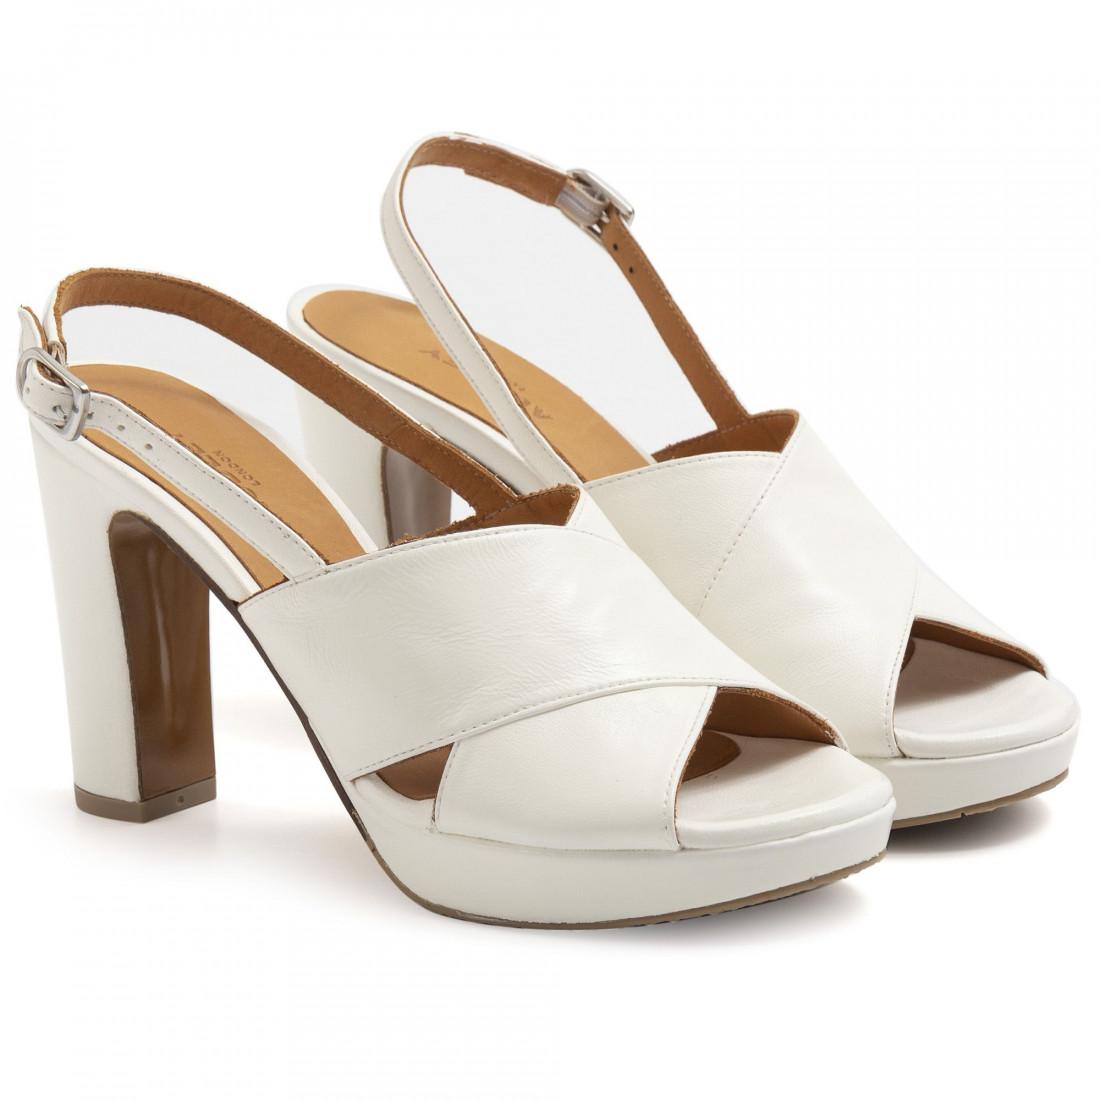 sandalen damen audley 21541off white nappa 7415